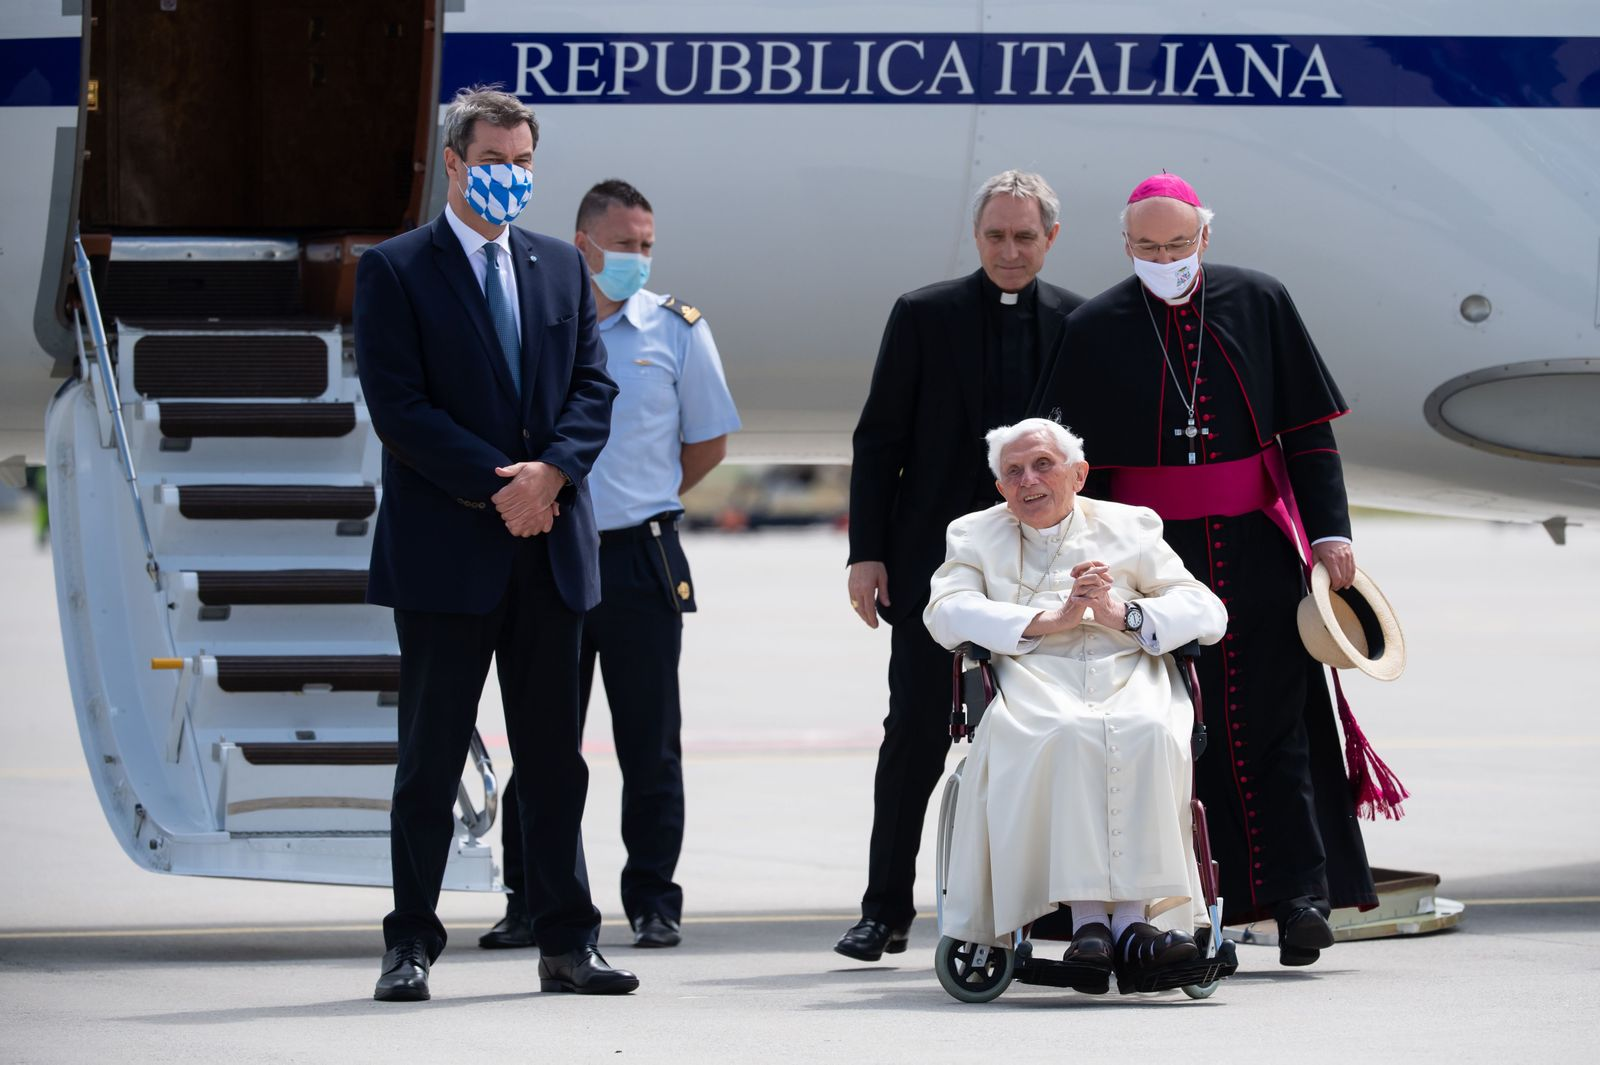 CORRECTION-GERMANY-POPE-RELIGION-HEALTH